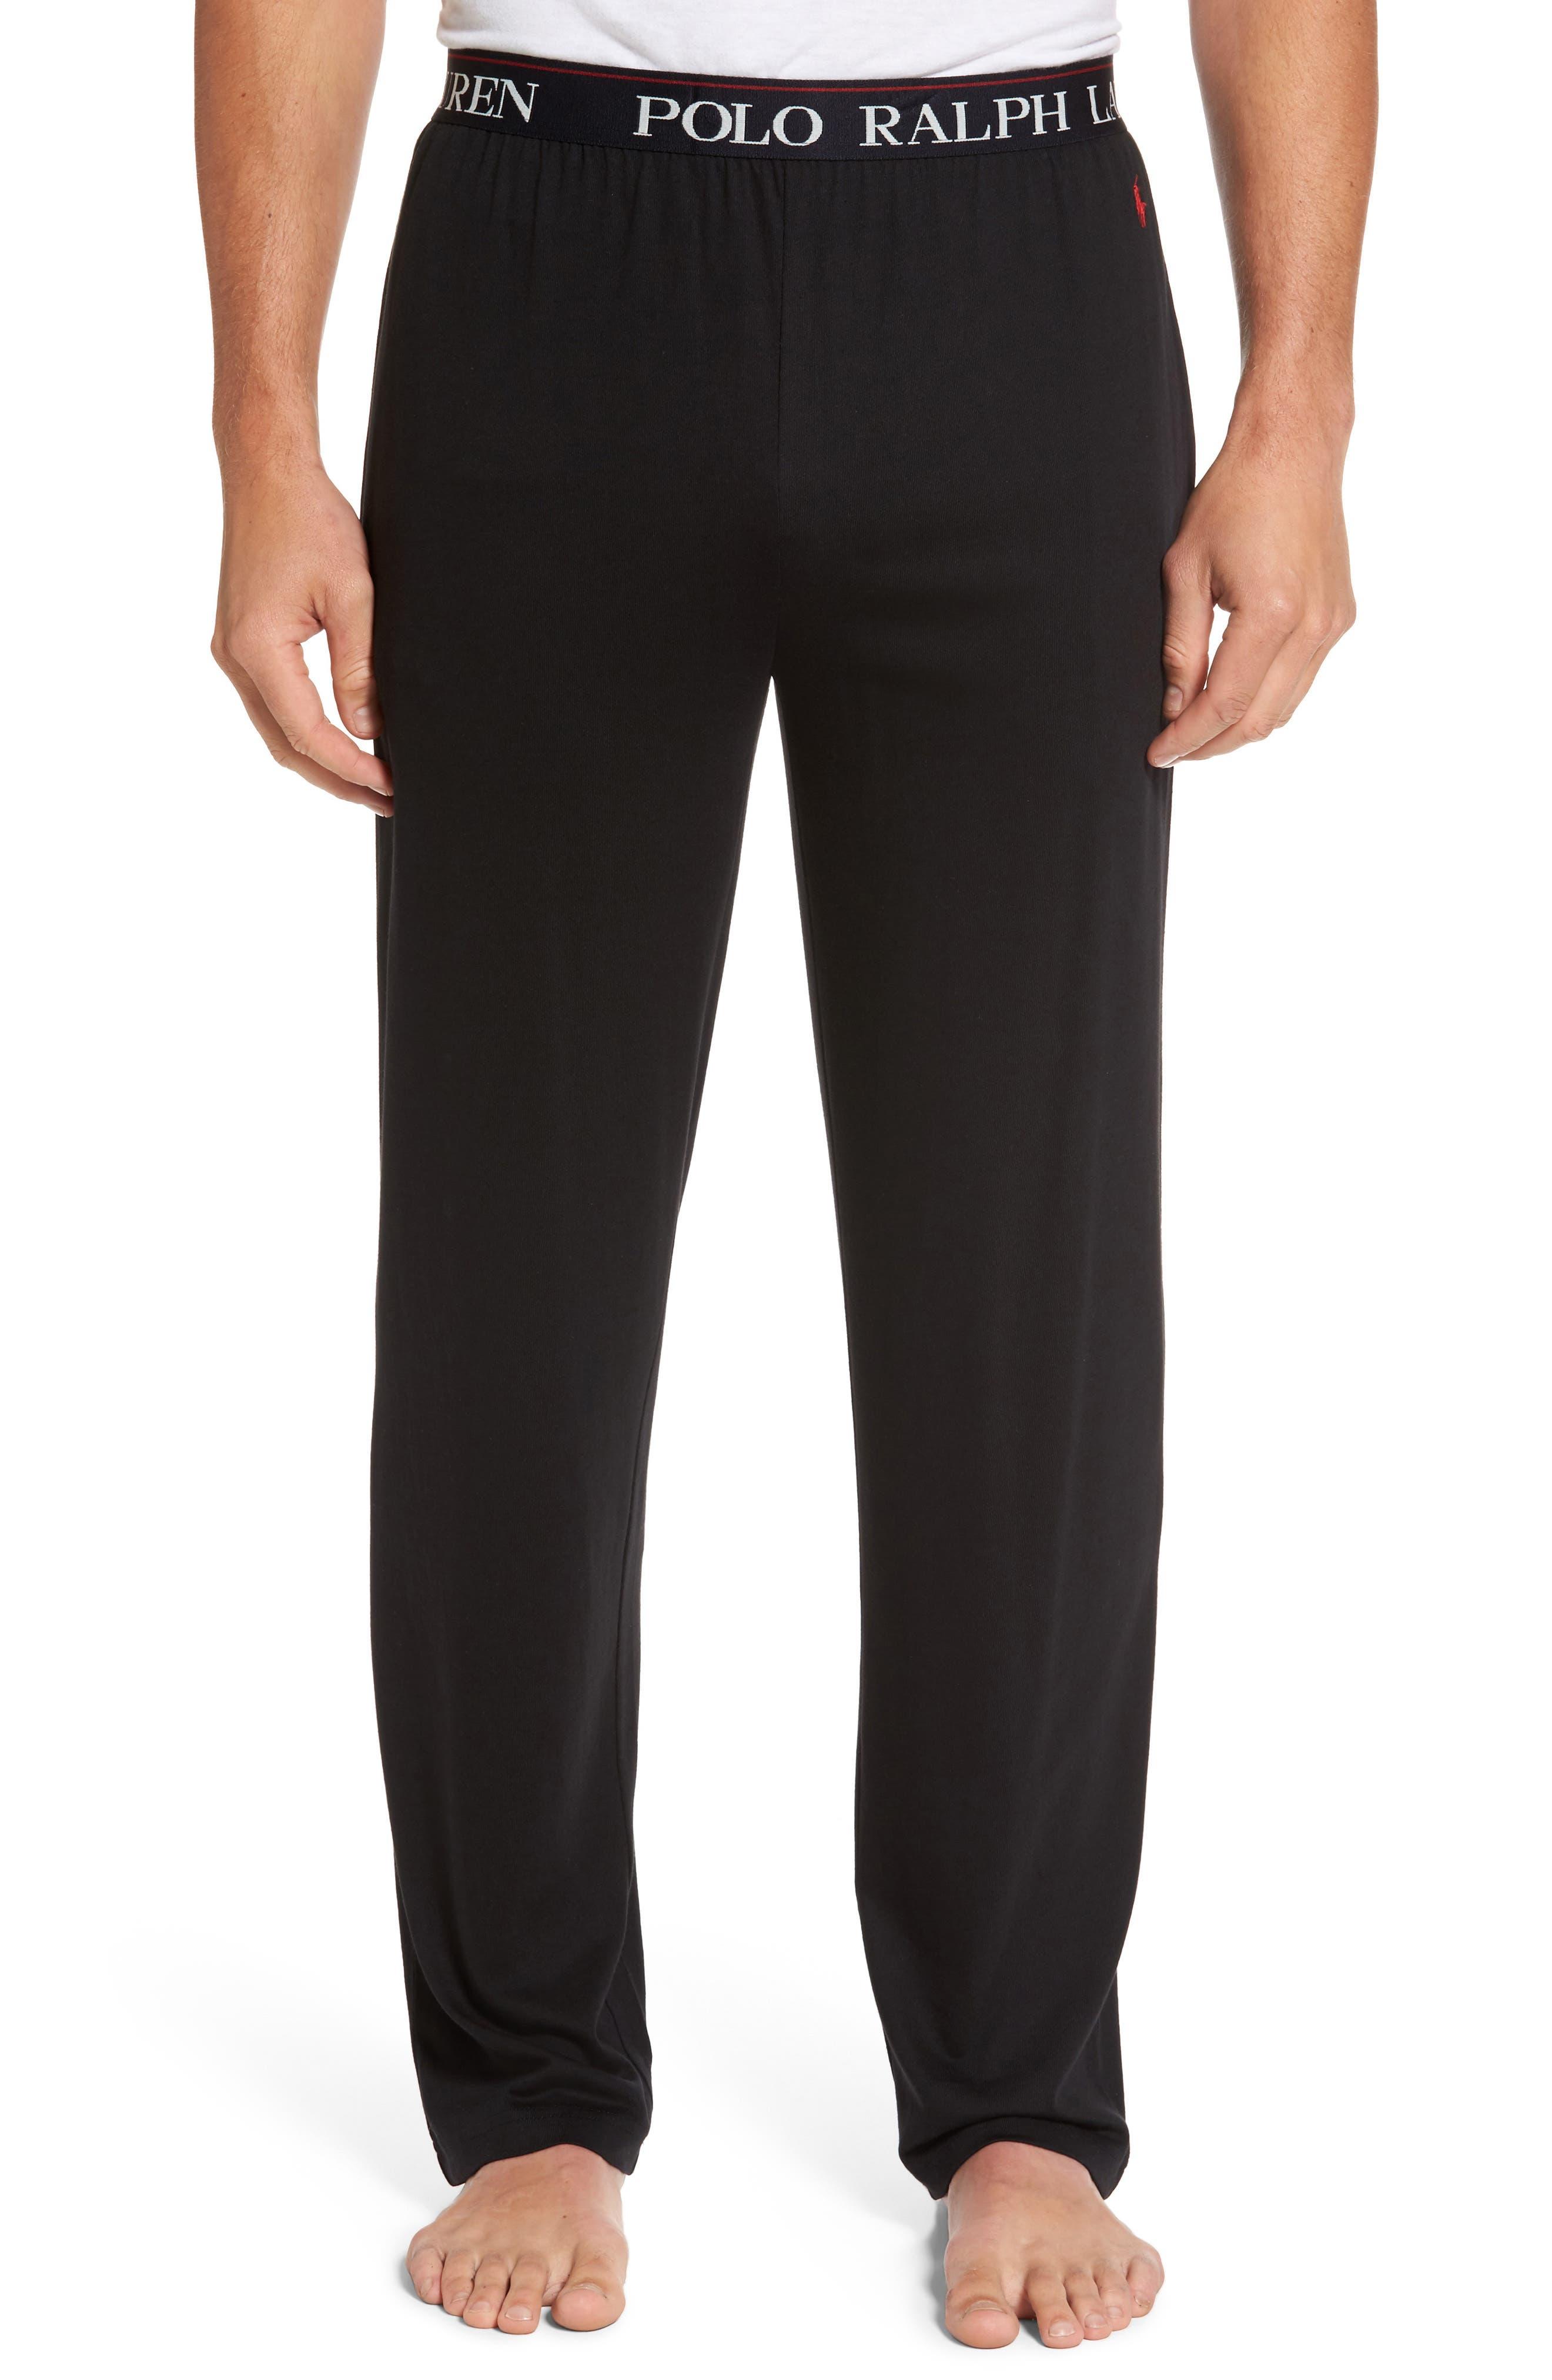 Polo Ralph Lauren Cotton & Modal Lounge Pants